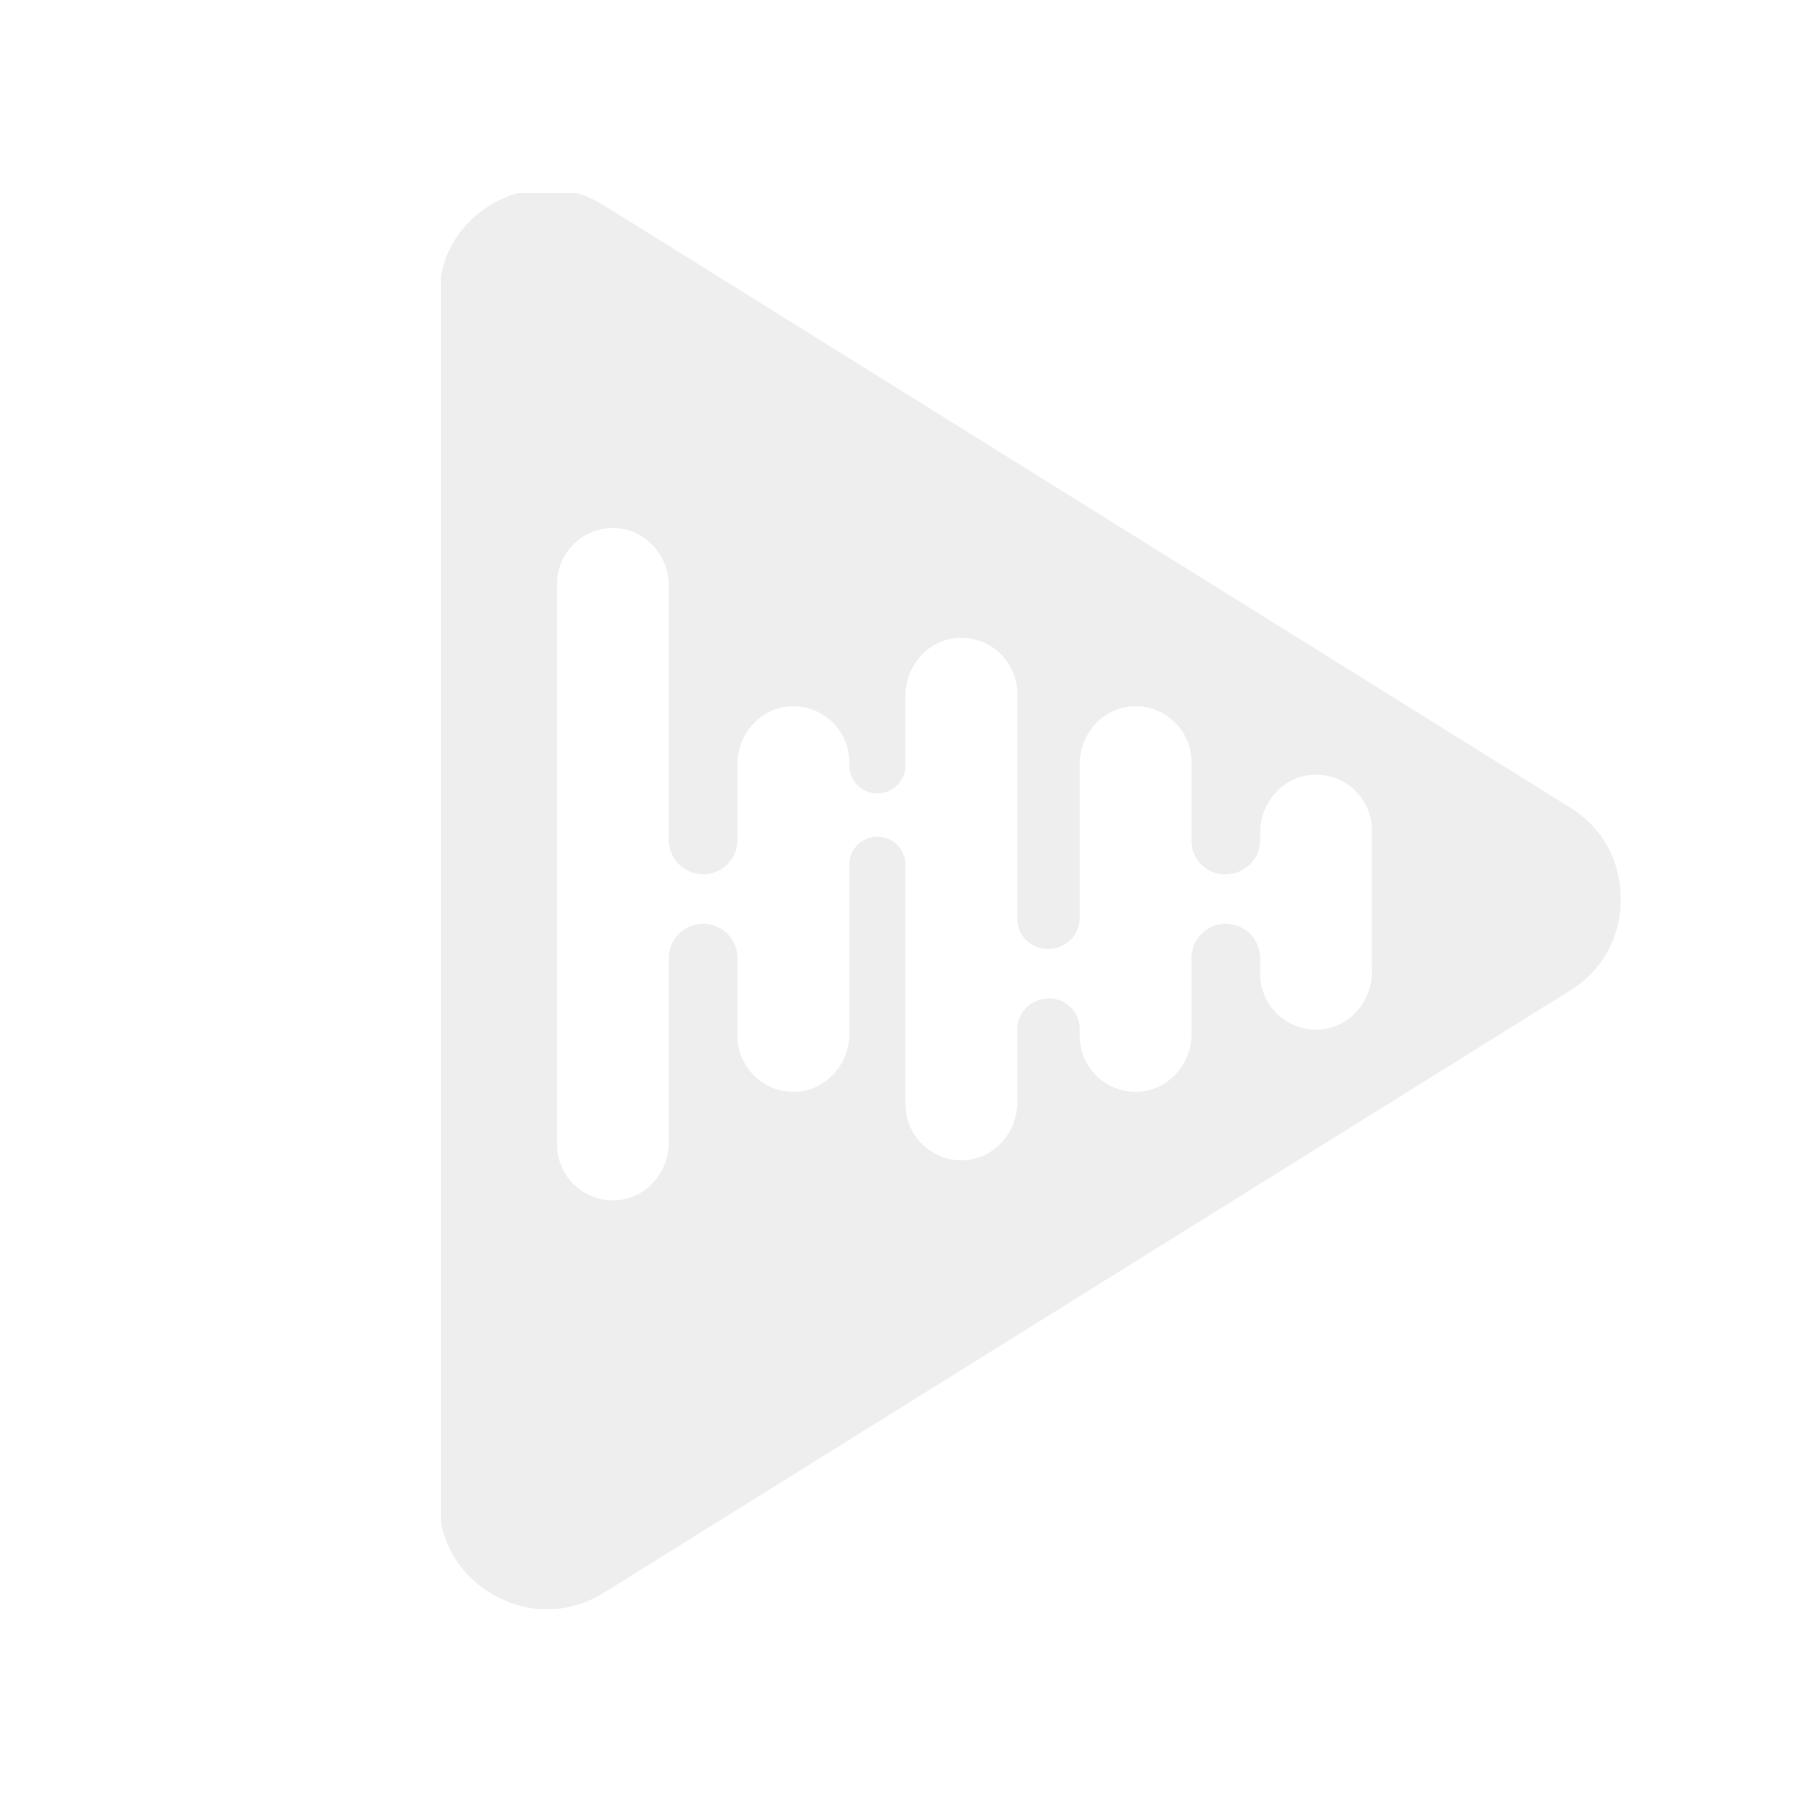 Audison APBMW-E88-HIFI